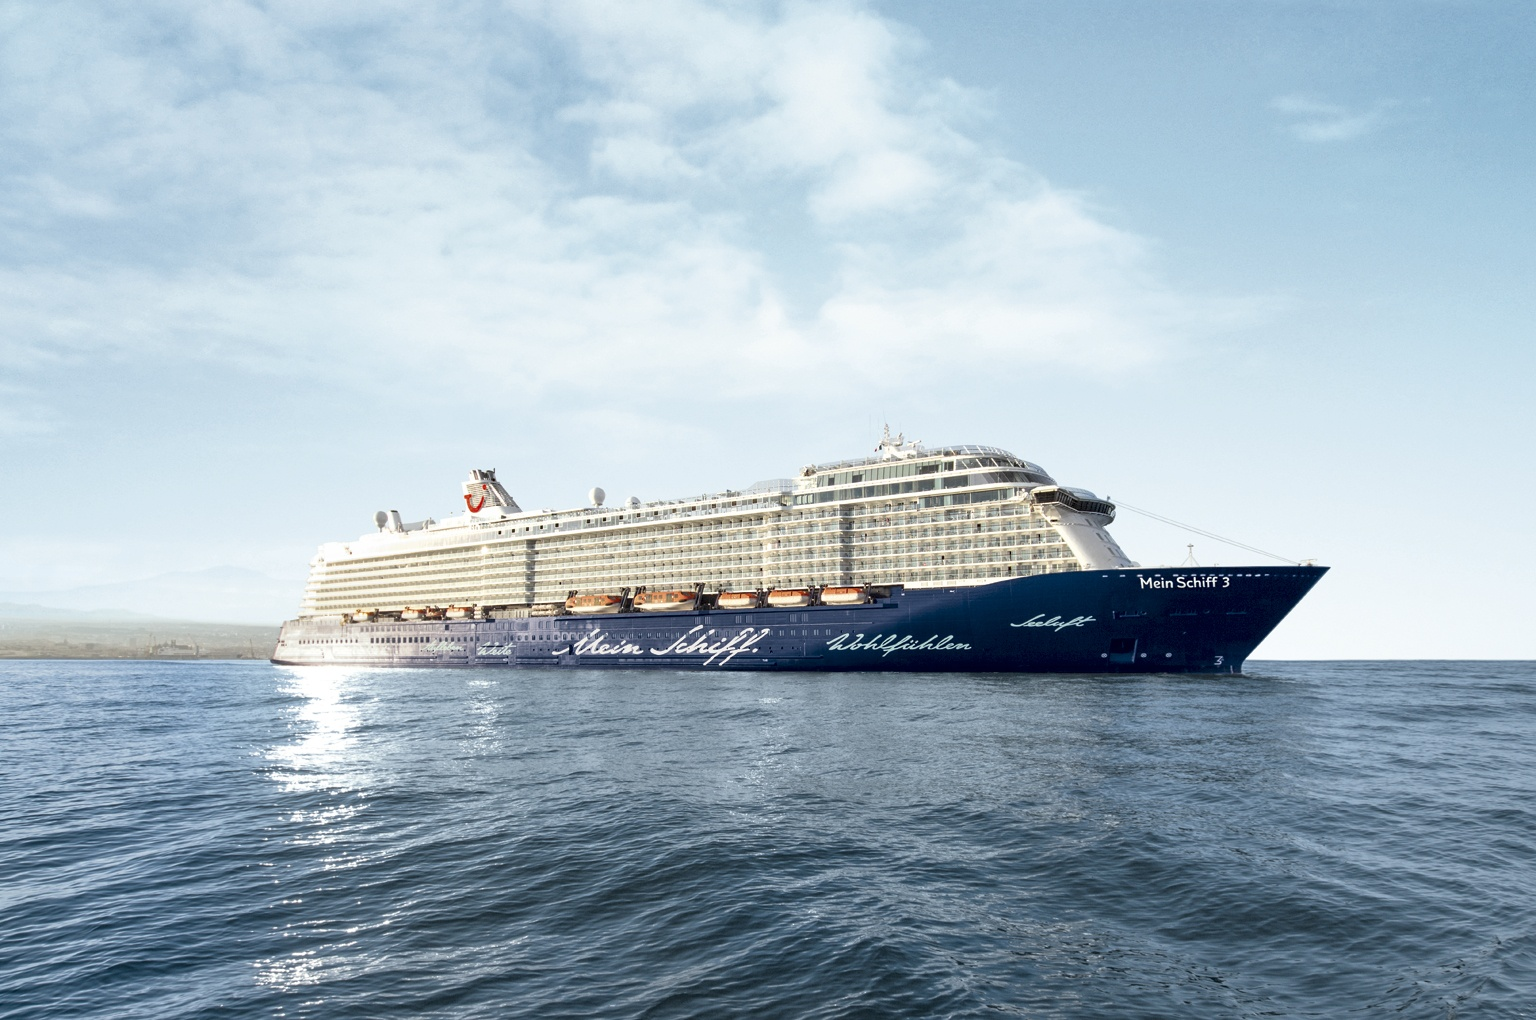 Ms Mein Schiff 3 Tui Cruises